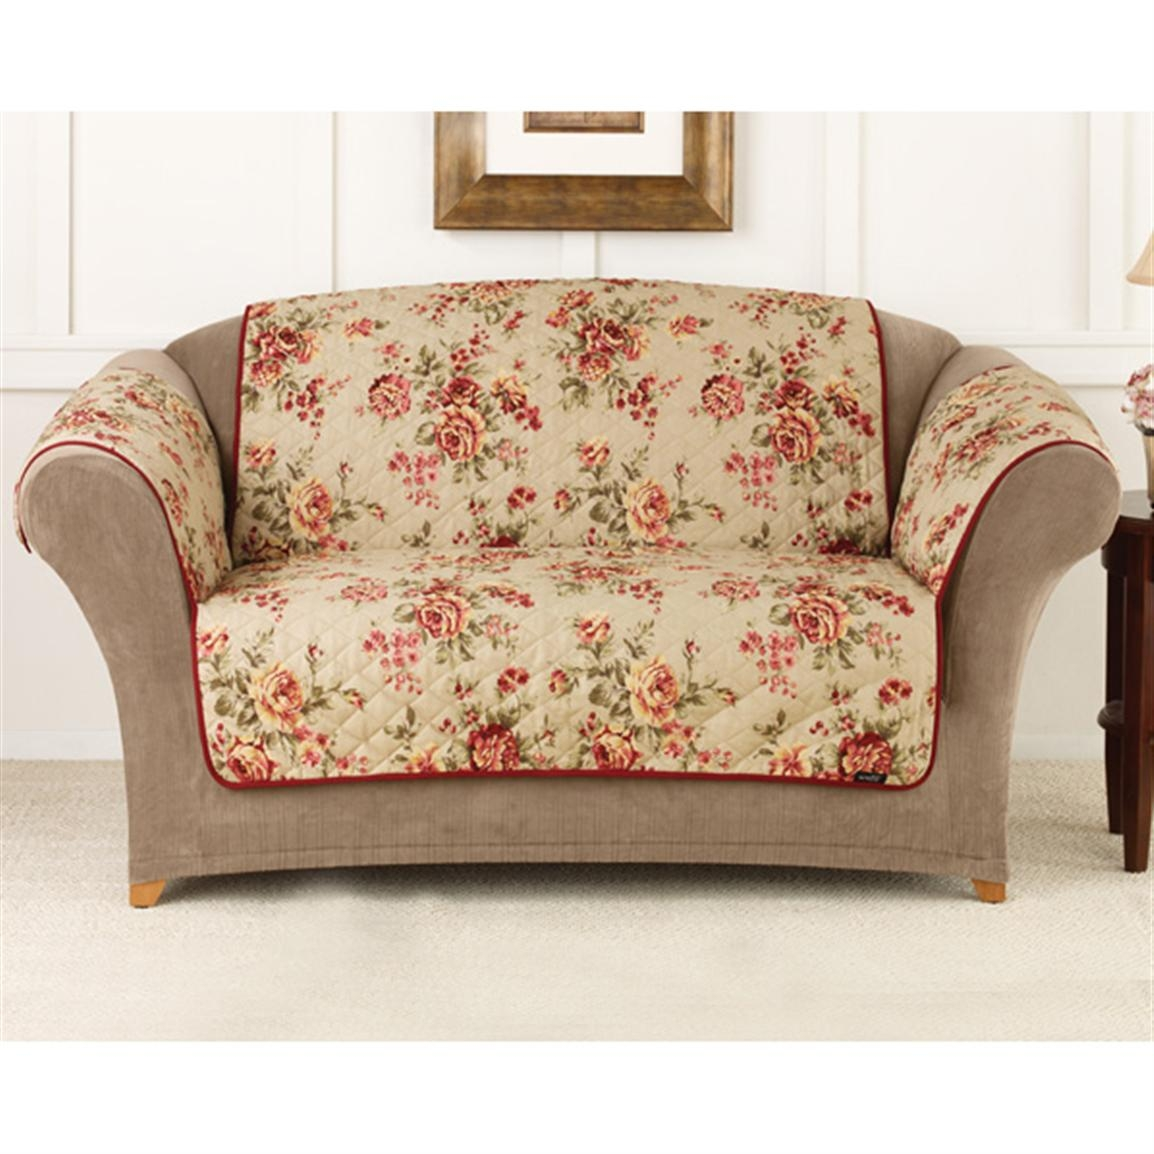 rose sofa slipcover zippered cushion covers chintz ideas